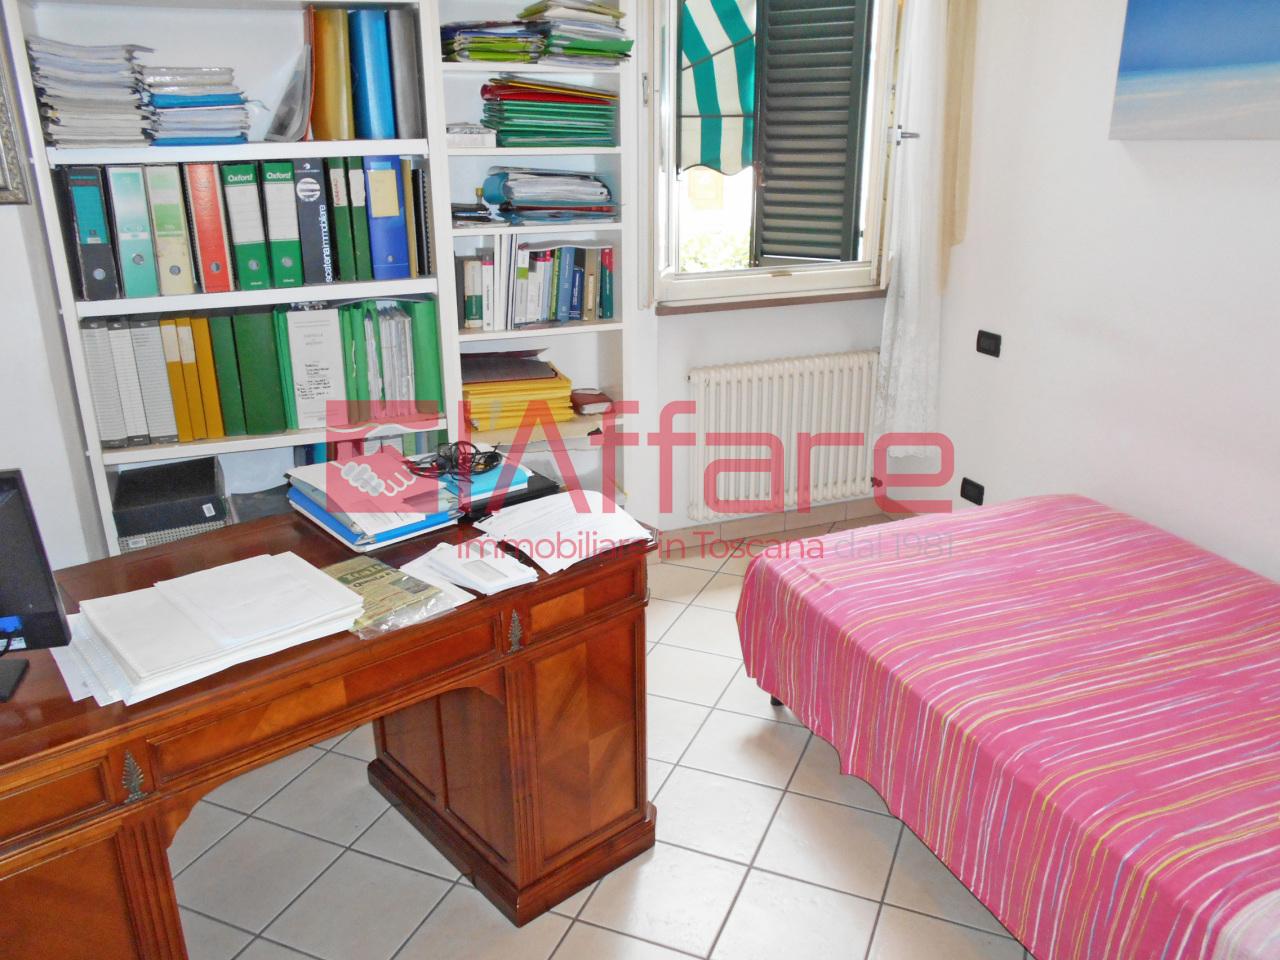 Appartamento a Montecatini-Terme (3/5)